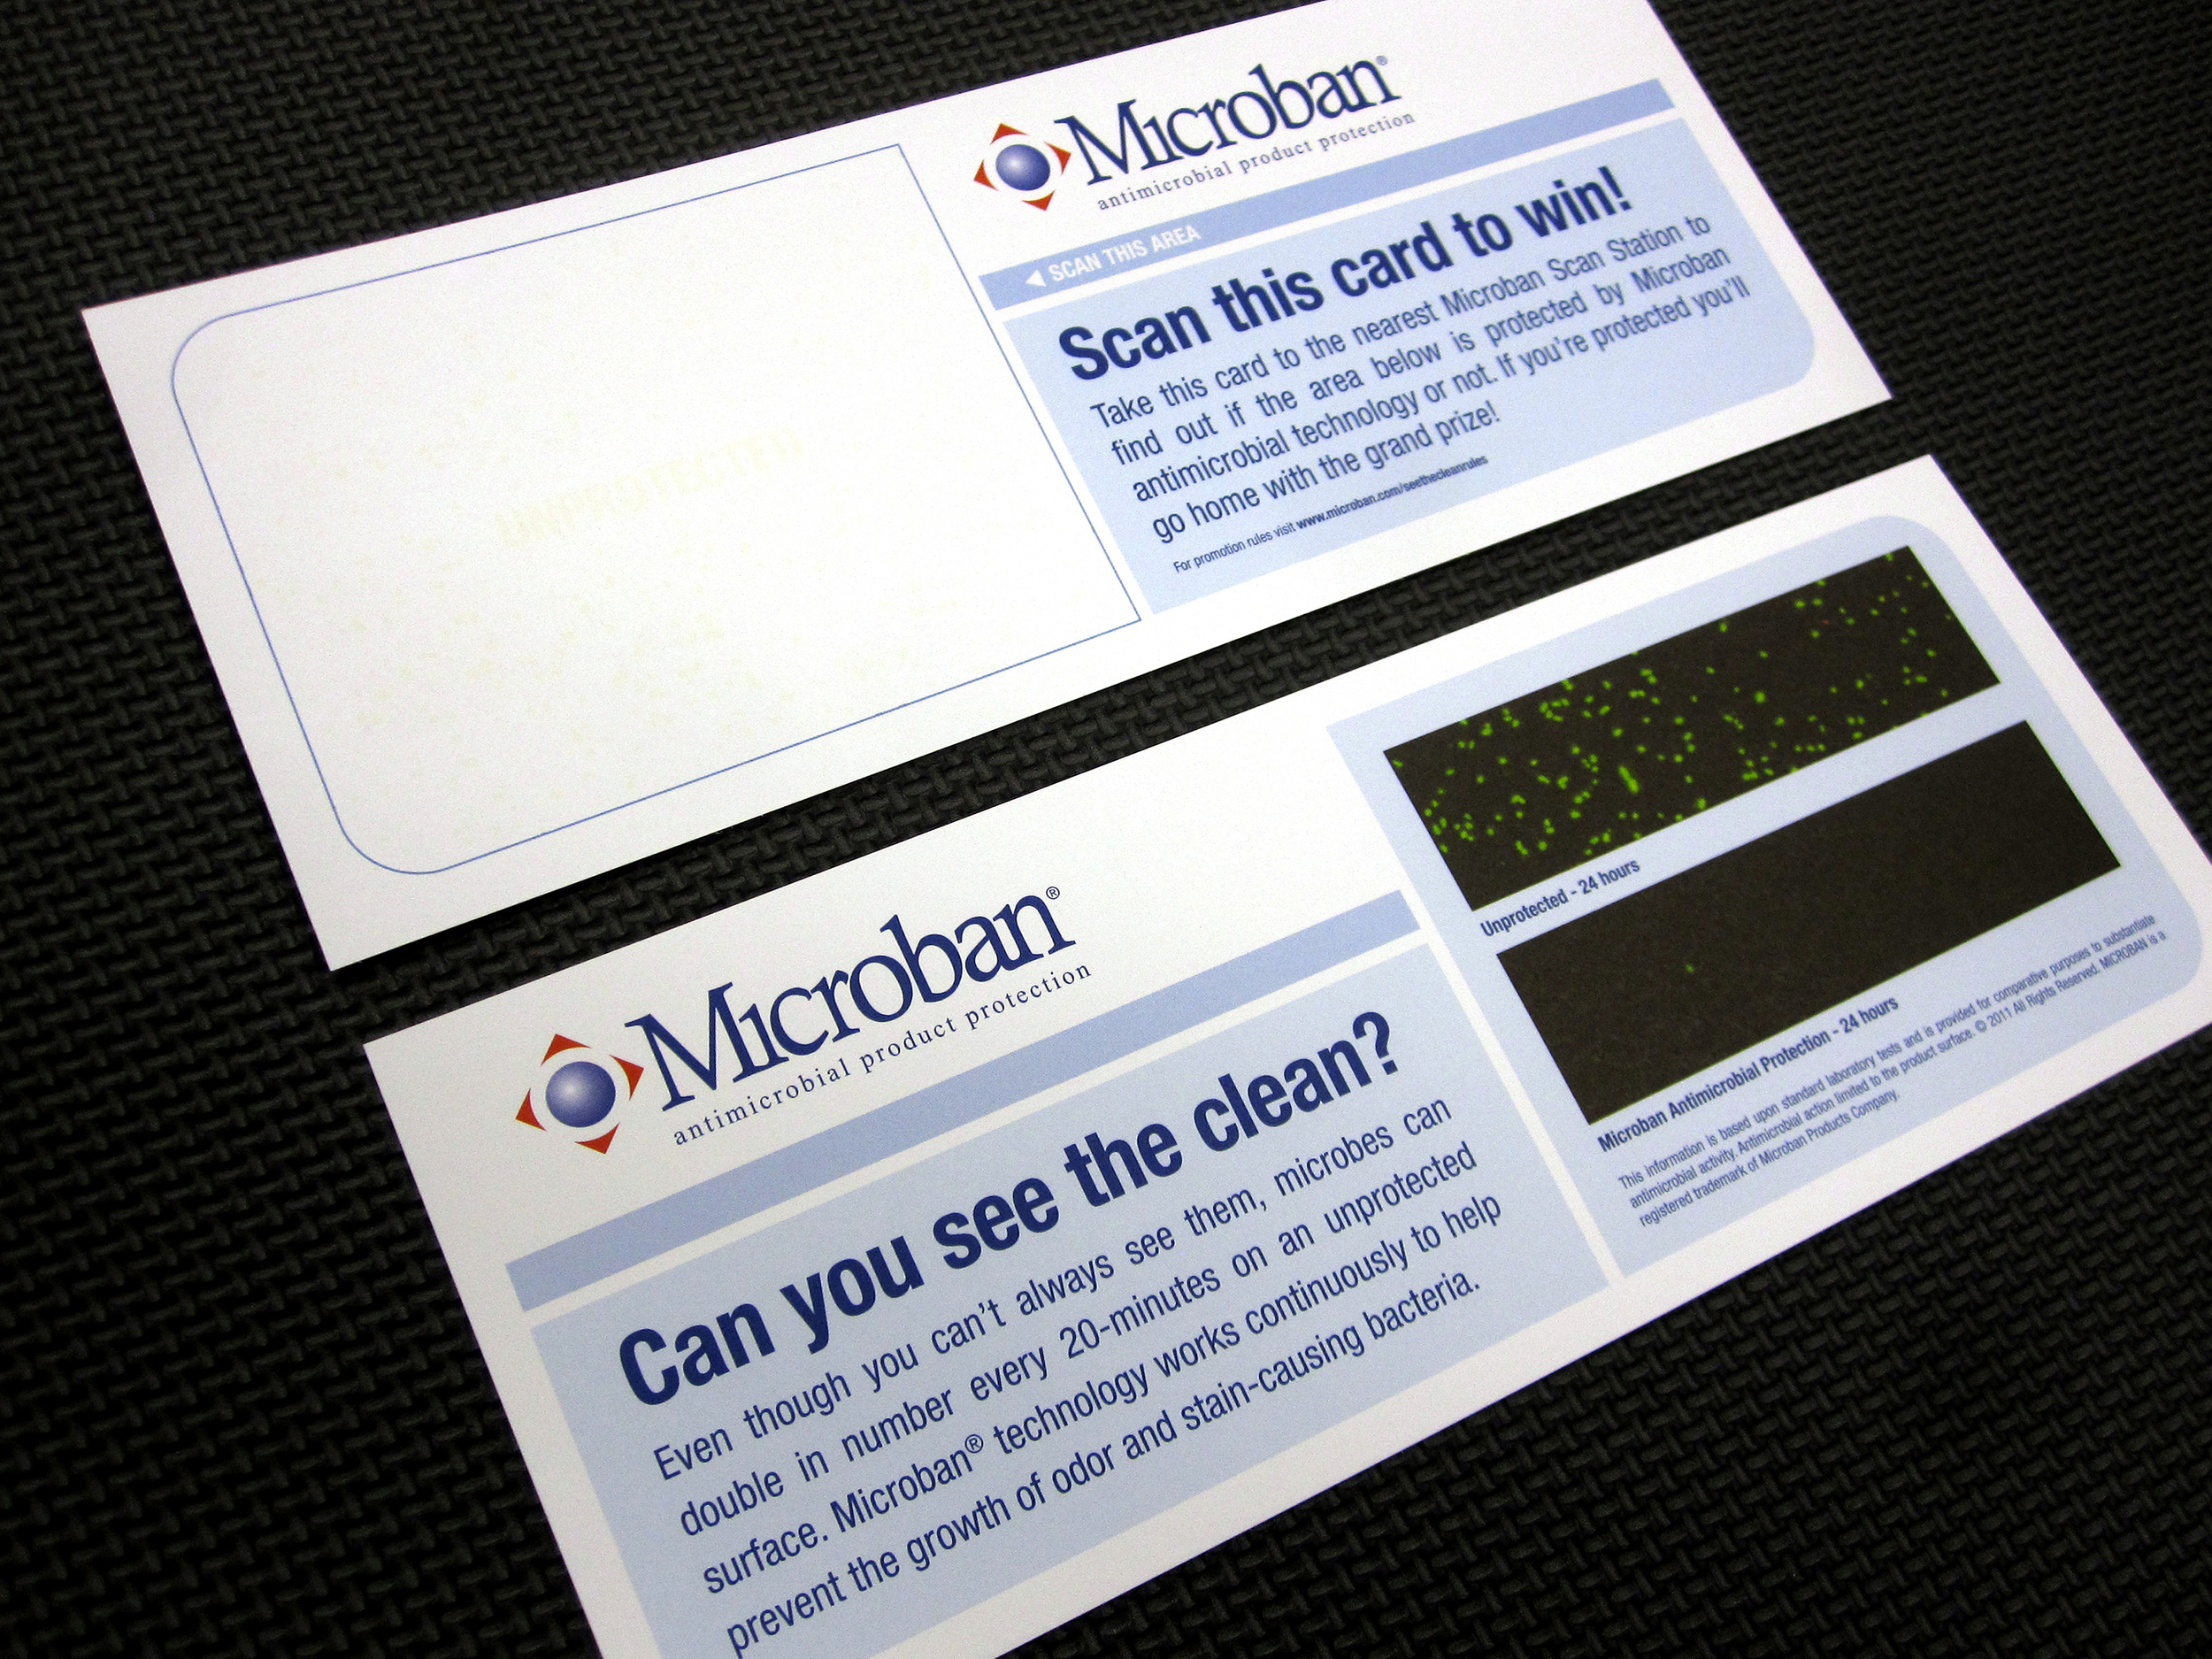 mb_card2.jpg